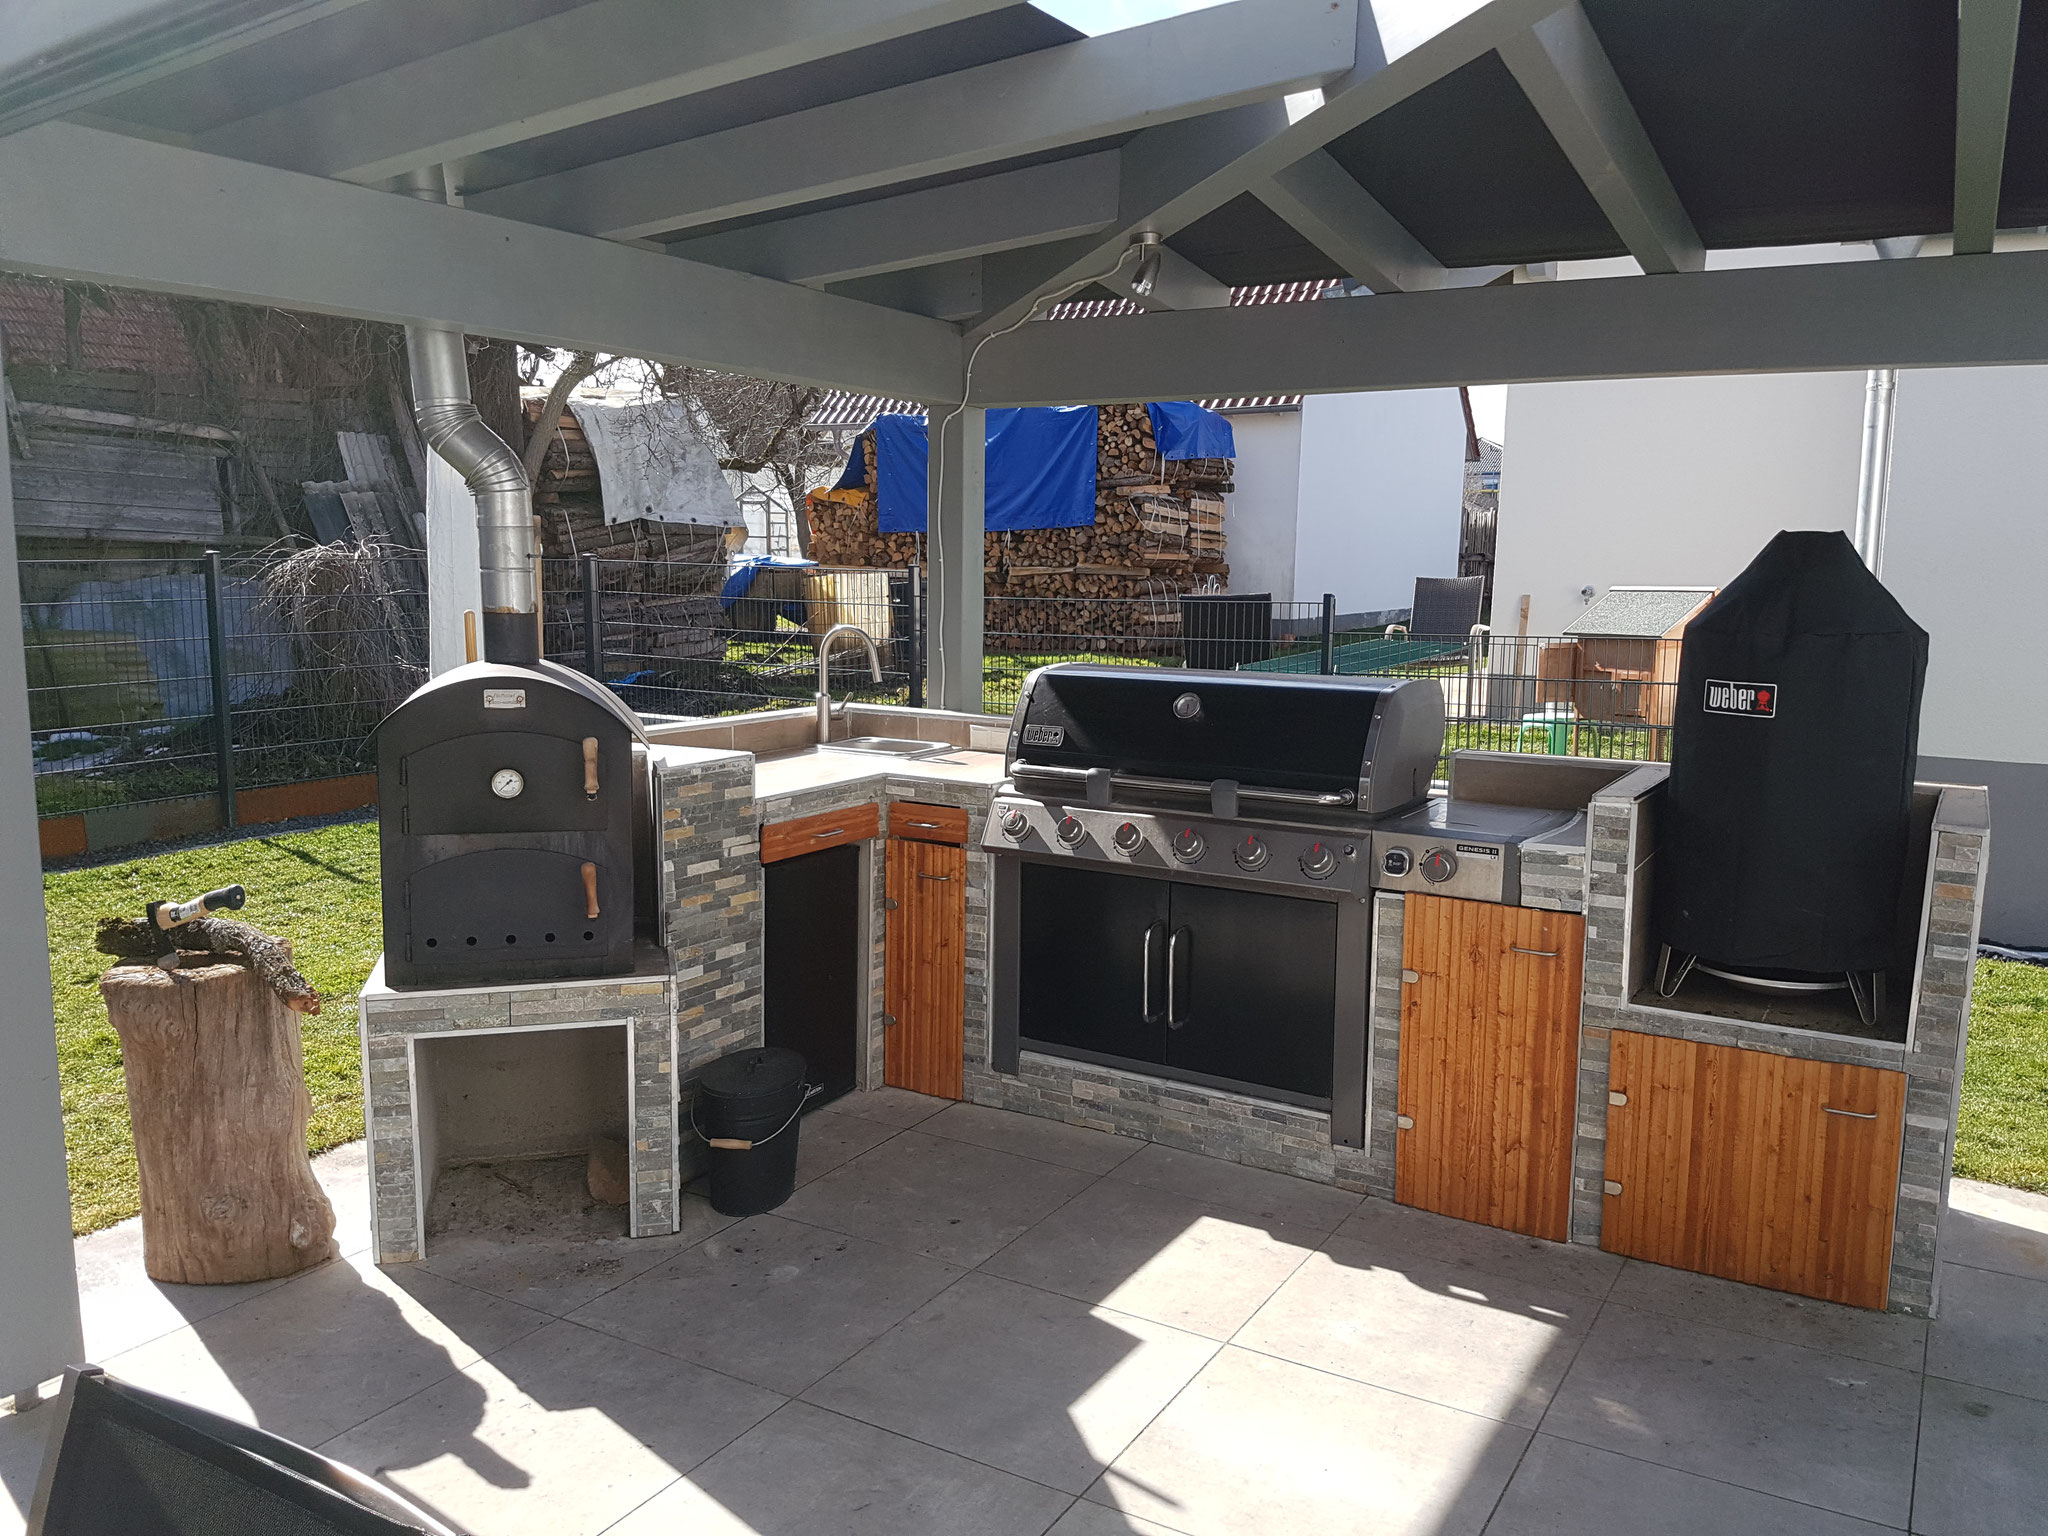 Outdoor Küche Weber : Outdoorküche mit weber grill outdoorküchen modell country privat